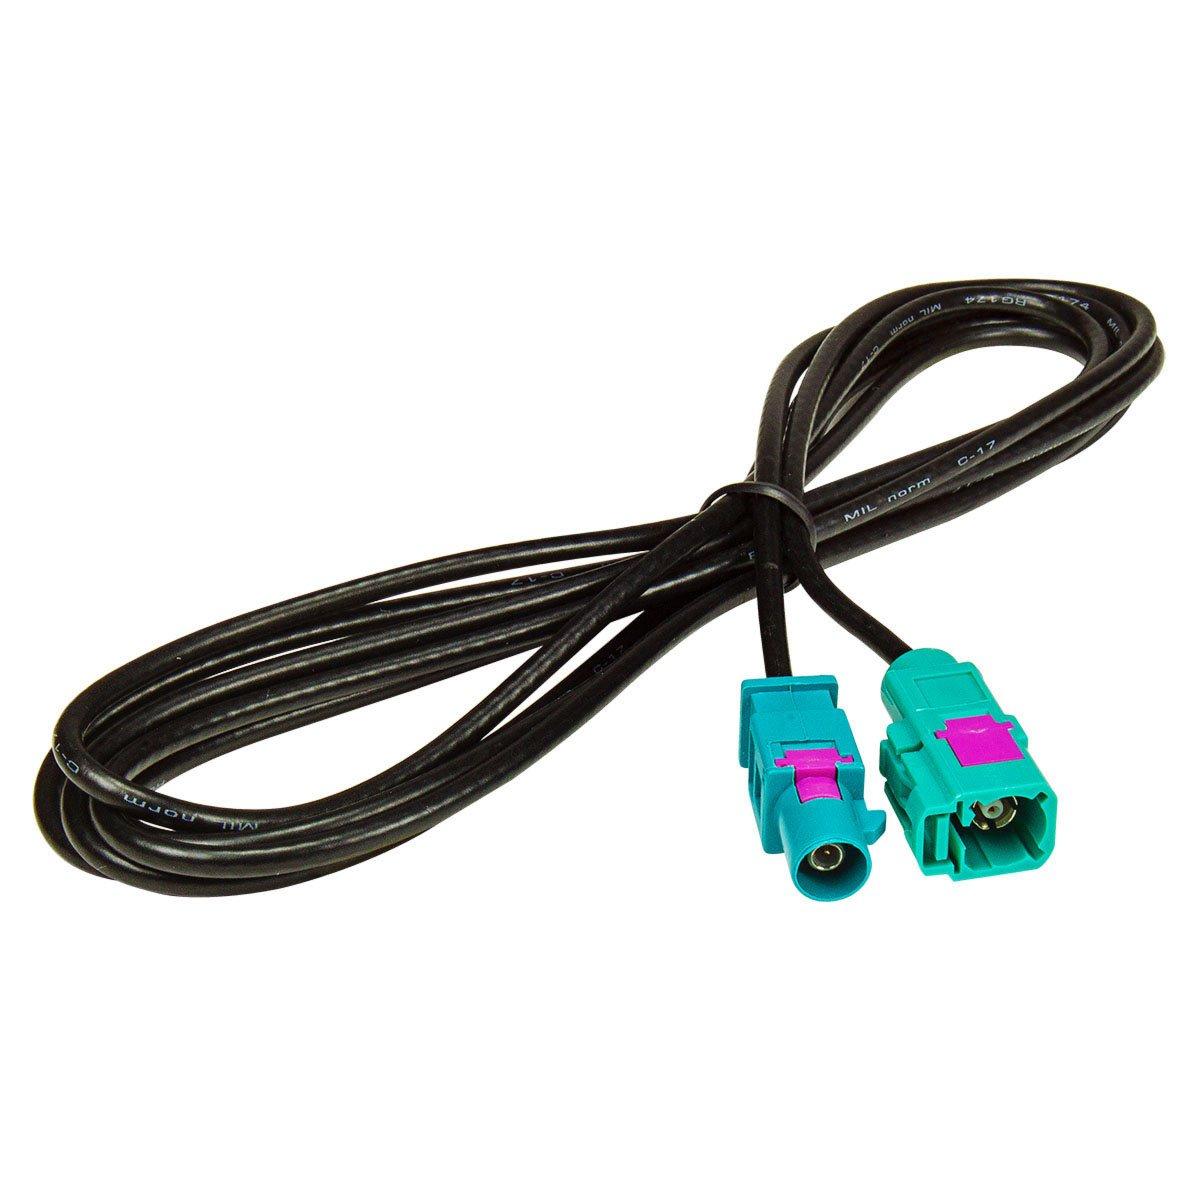 Rallonge 2 m pour antenne fakra mâ le vers femelle fakra rG174 cable tomzz Audio ® 1600-012